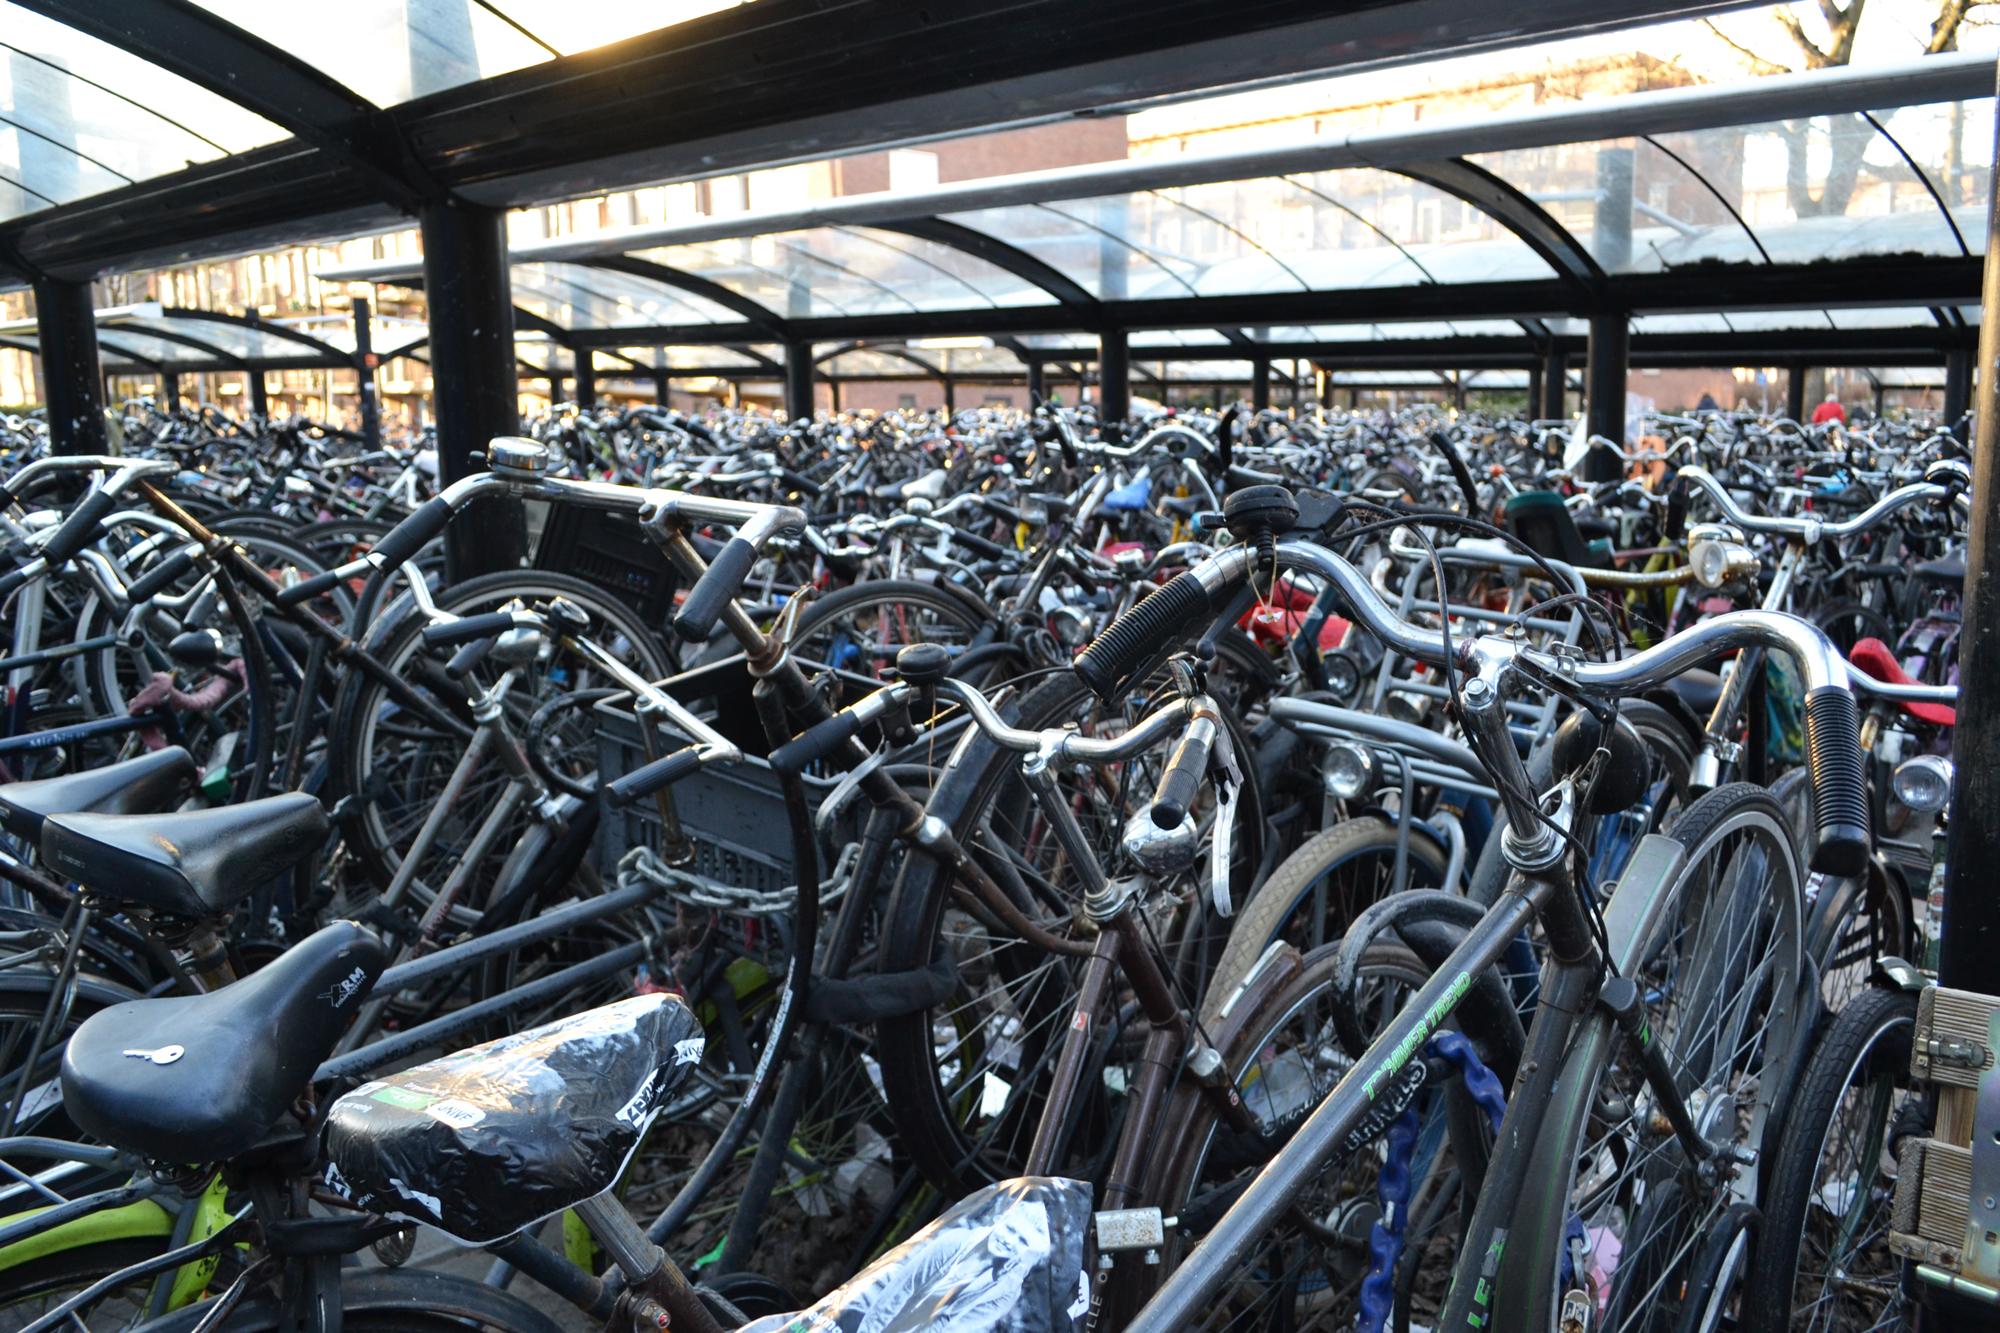 urbanbacklog-amsterdam-bicycle-city-2.jpg